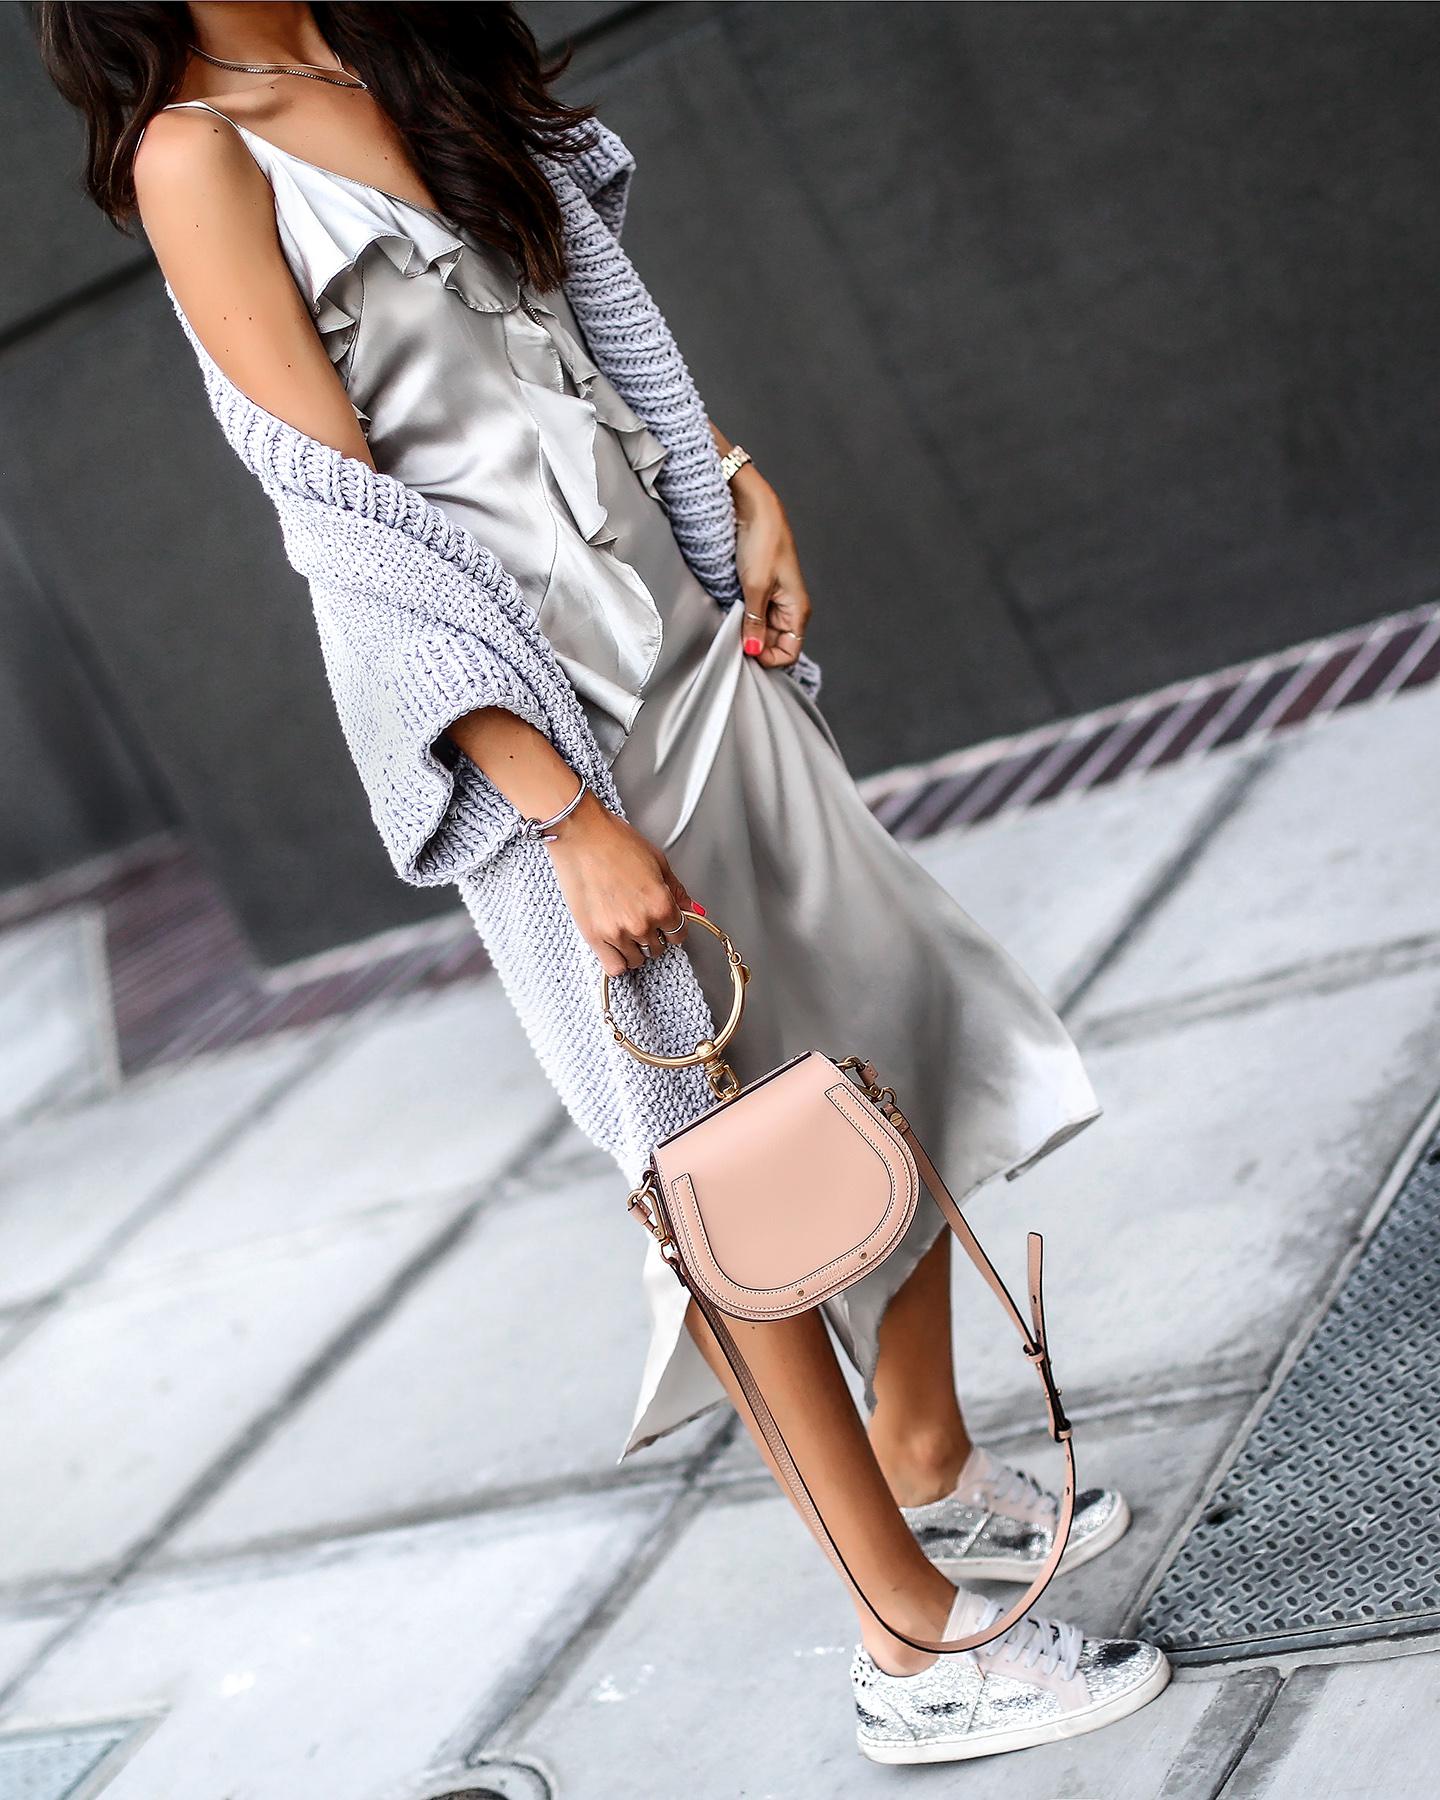 MLM_the_Label_Ruffle_Dress_I_Love_Mister_Mittens_KImono_Sweater_Dolce_Vita_Sneakers_Chloe_Nile_Bag.jpg